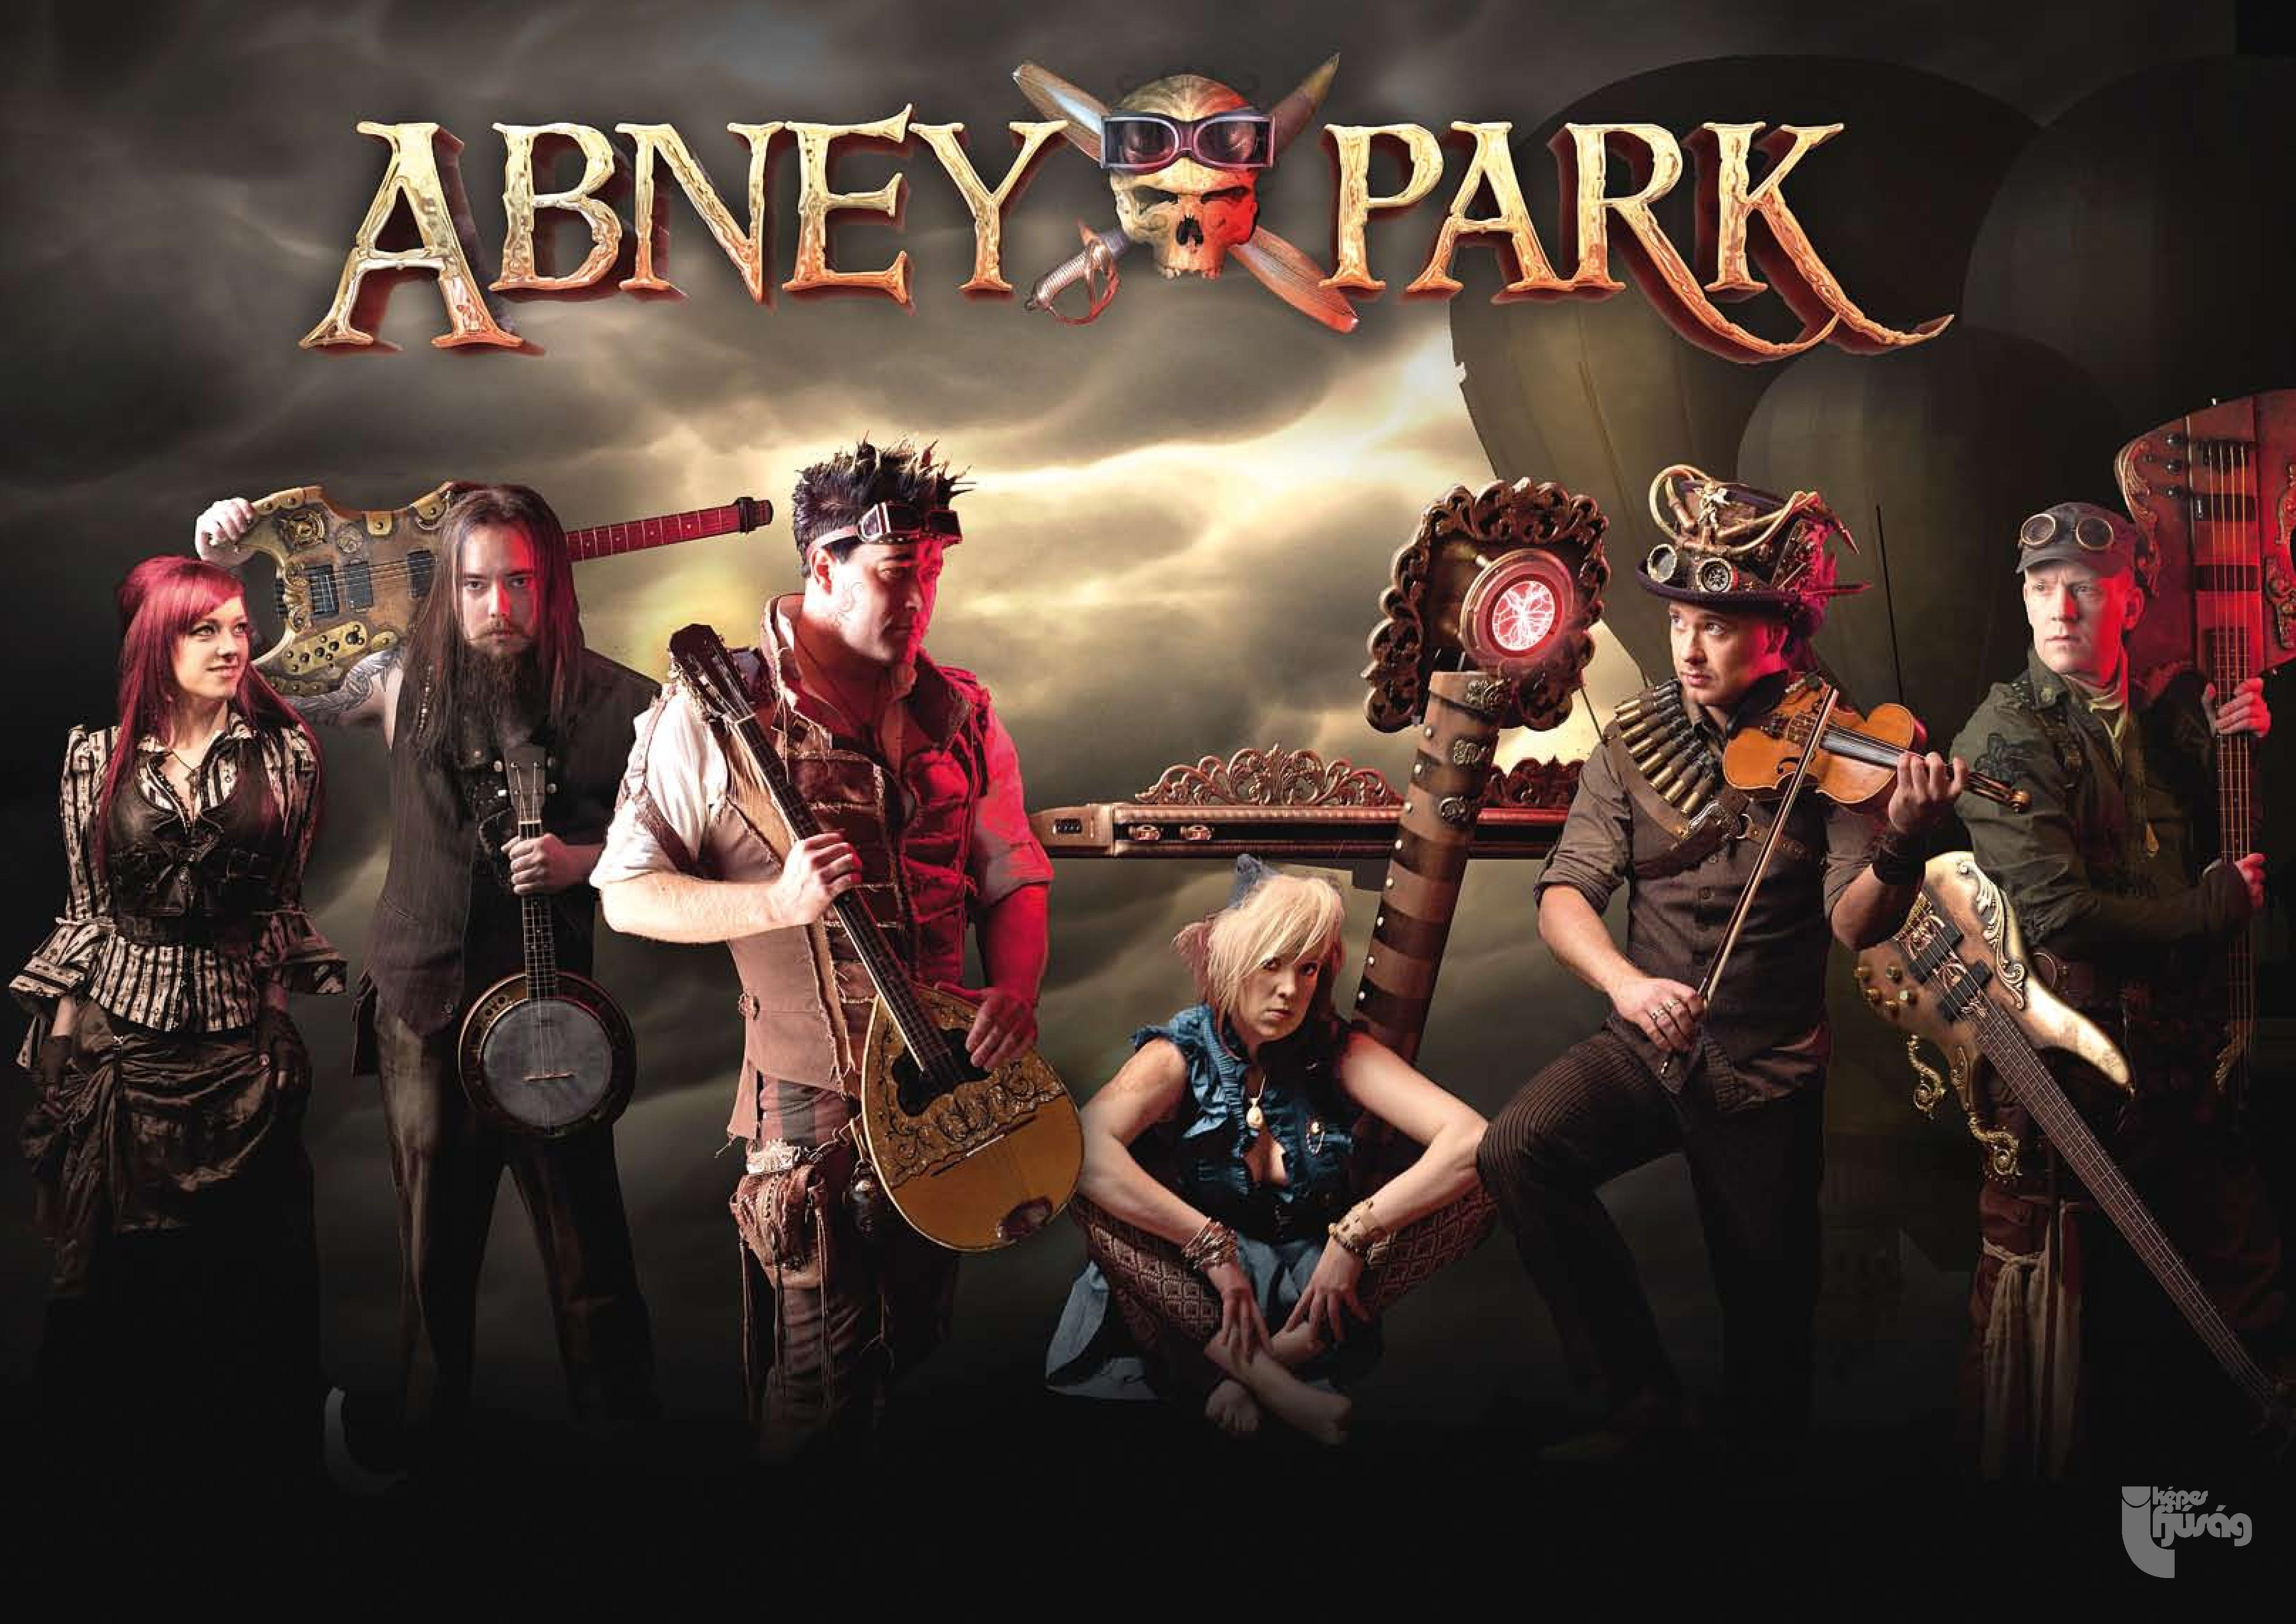 www.abneypark.com